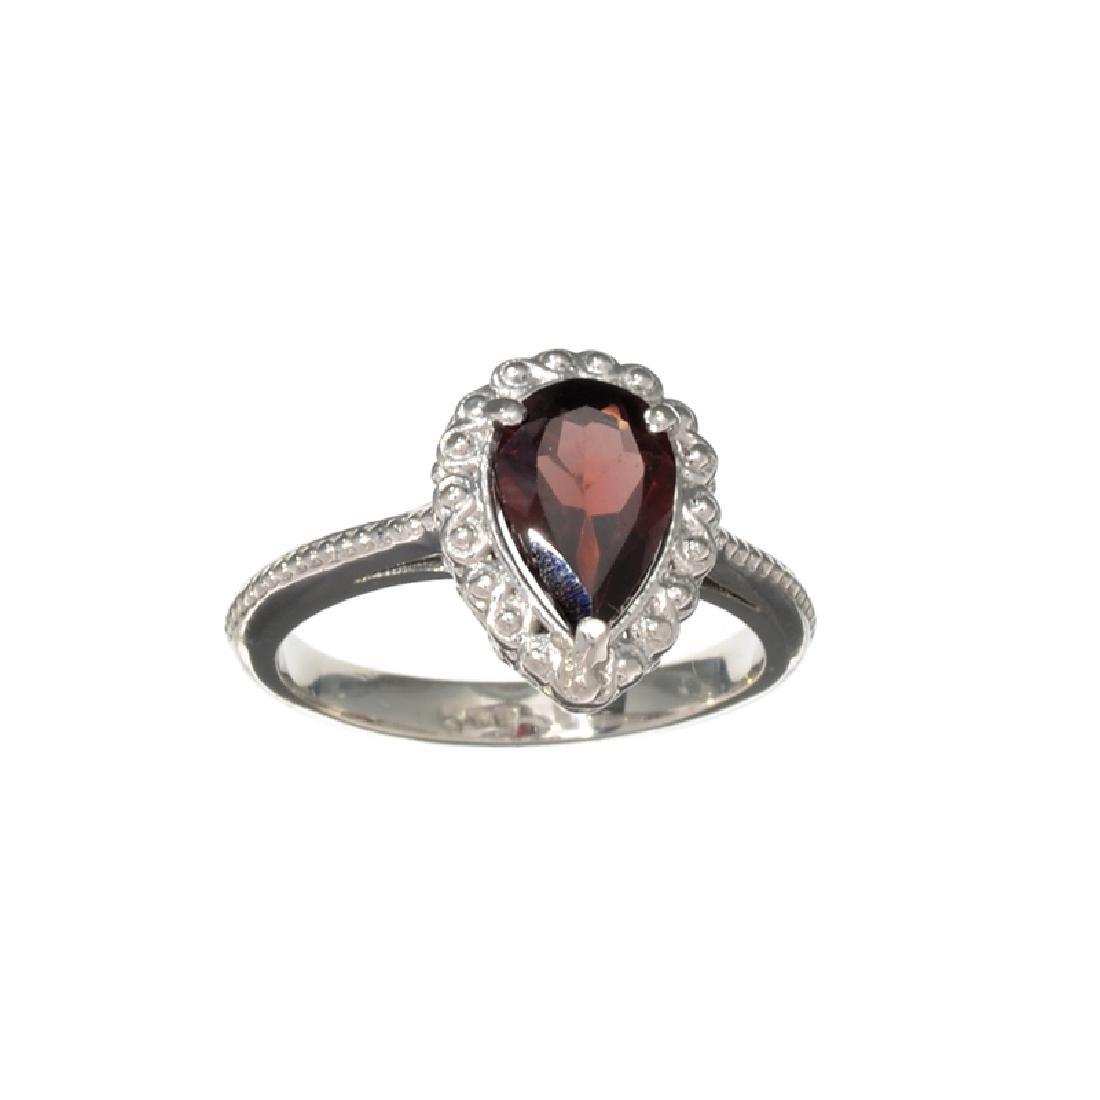 APP: 0.3k Fine Jewelry 2.27CT Pear Cut Red Almandite